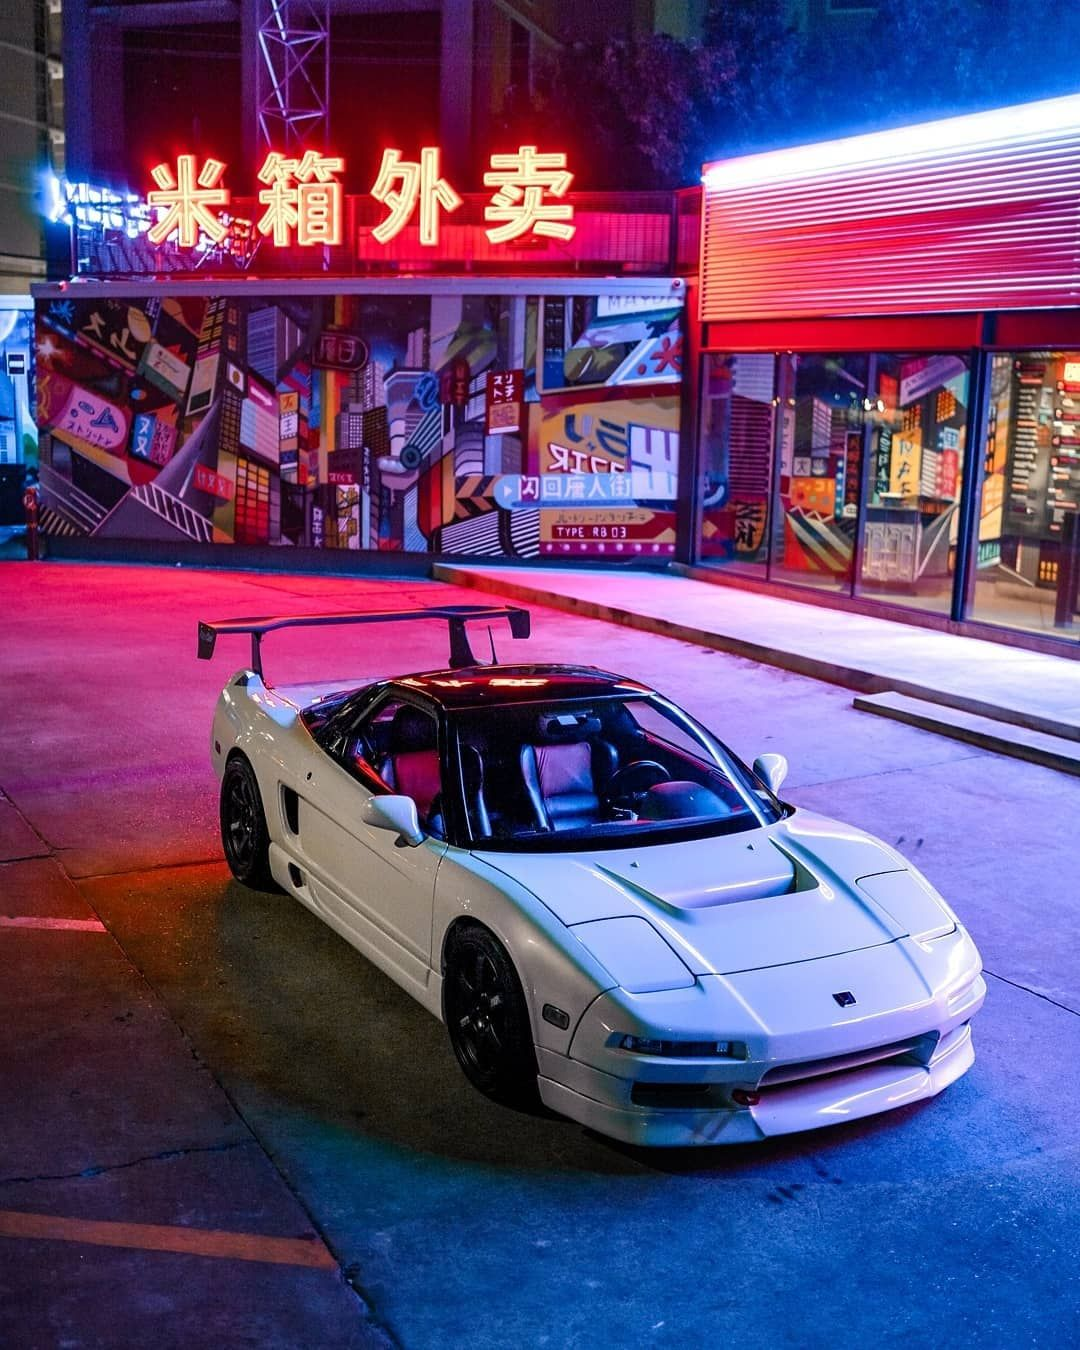 𝗦𝘁𝗿𝗲𝗲𝘁 𝗖𝗼𝗻𝗰𝗼𝘂𝗿𝘀 S Instagram Photo Honda Nsx Honda Acura Pic Riceboxed Honda Acura Nsx Neon Design In 2020 Street Racing Cars Nsx Tuner Cars